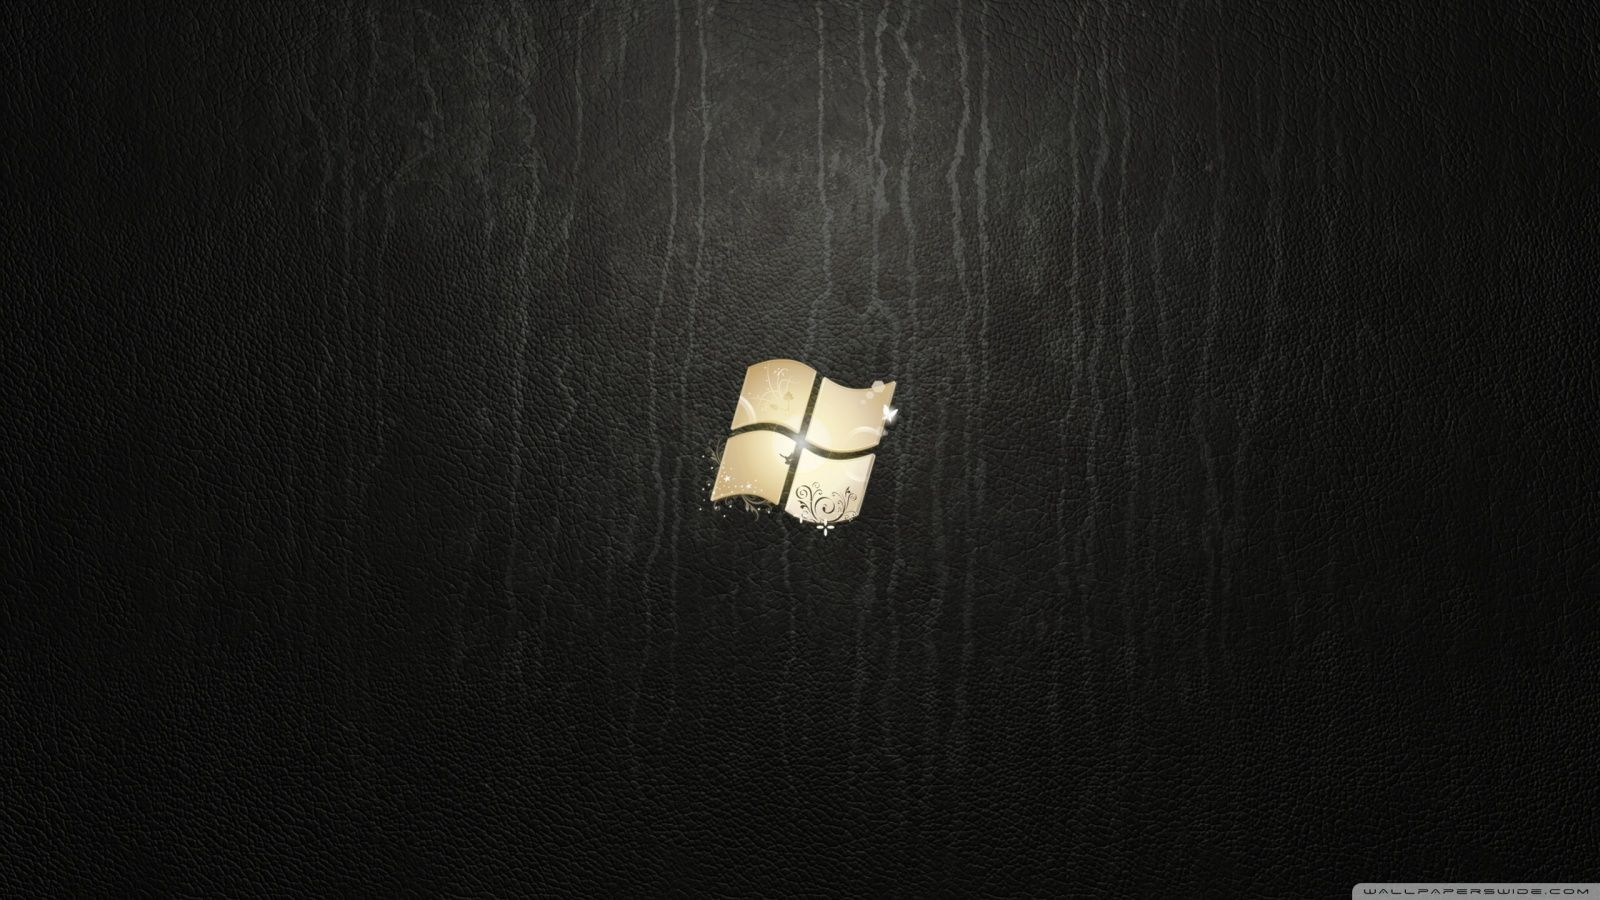 Windows 7 Ultimate Leather Hd Desktop Wallpaper Fullscreen Dual Windows Wallpaper Hd Cool Wallpapers Dark Wallpaper